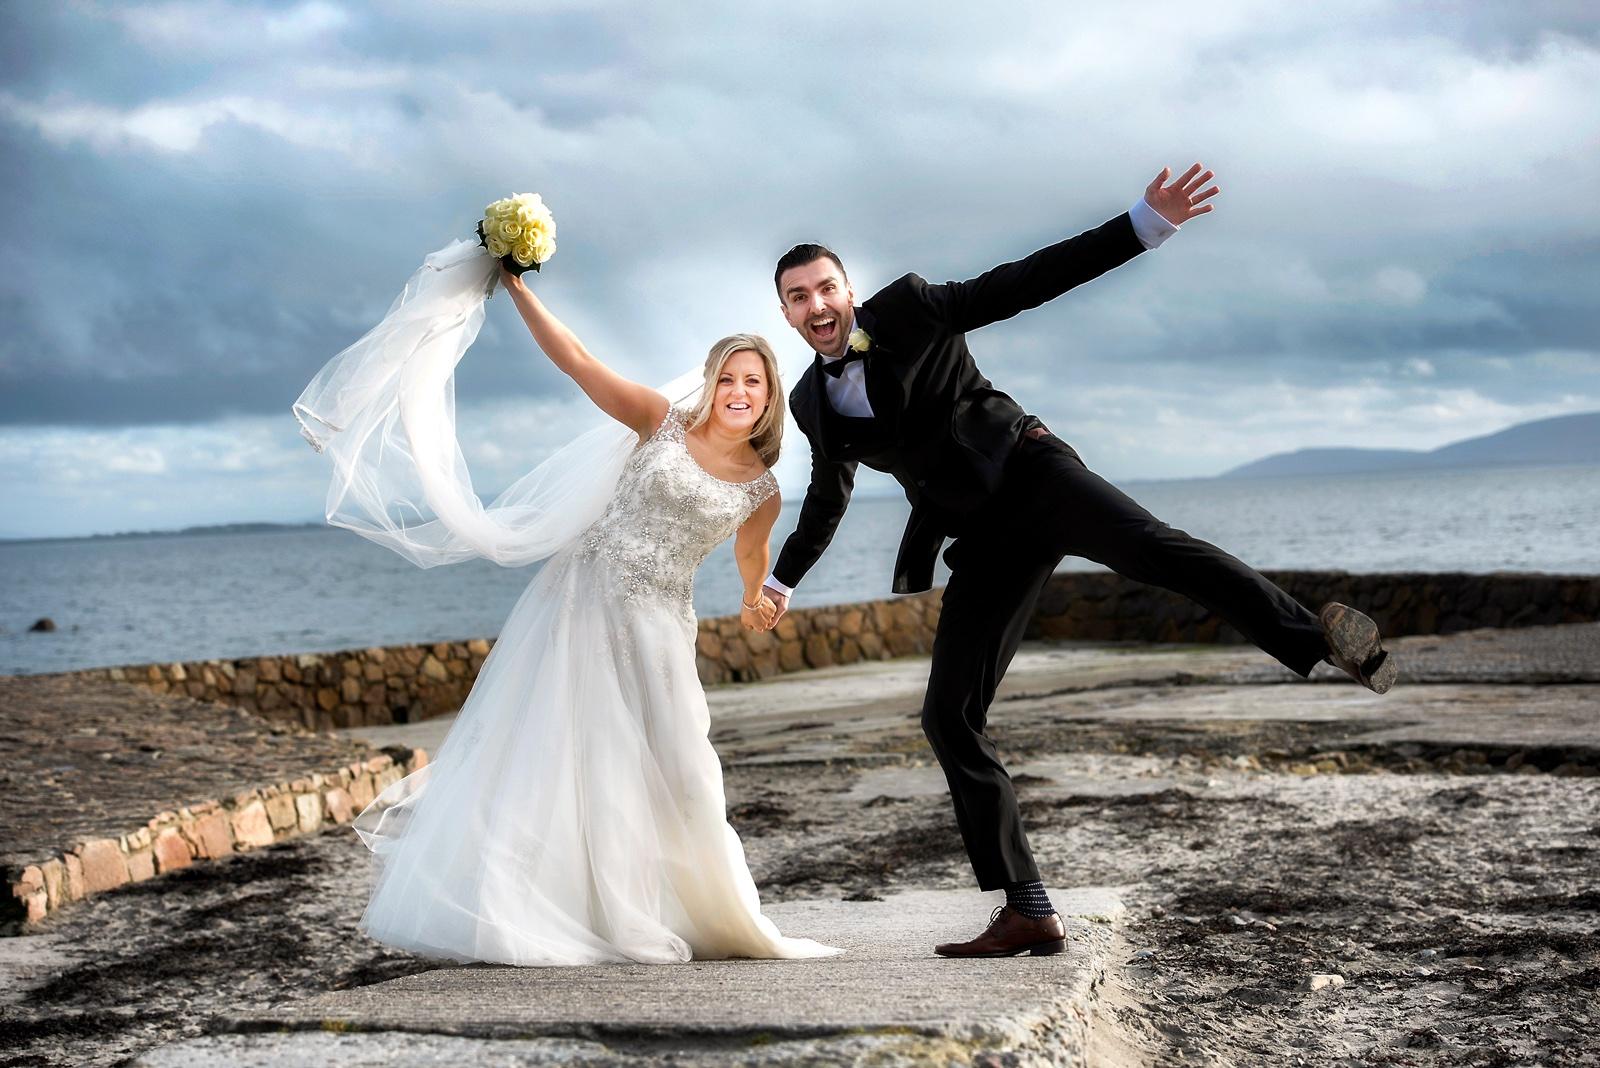 e88473d5b66 Galway Wedding Photographer - Dillon Photography - Award Winning Images - Wedding  Photographer of the Year - Elopement and Destination Weddings Ireland